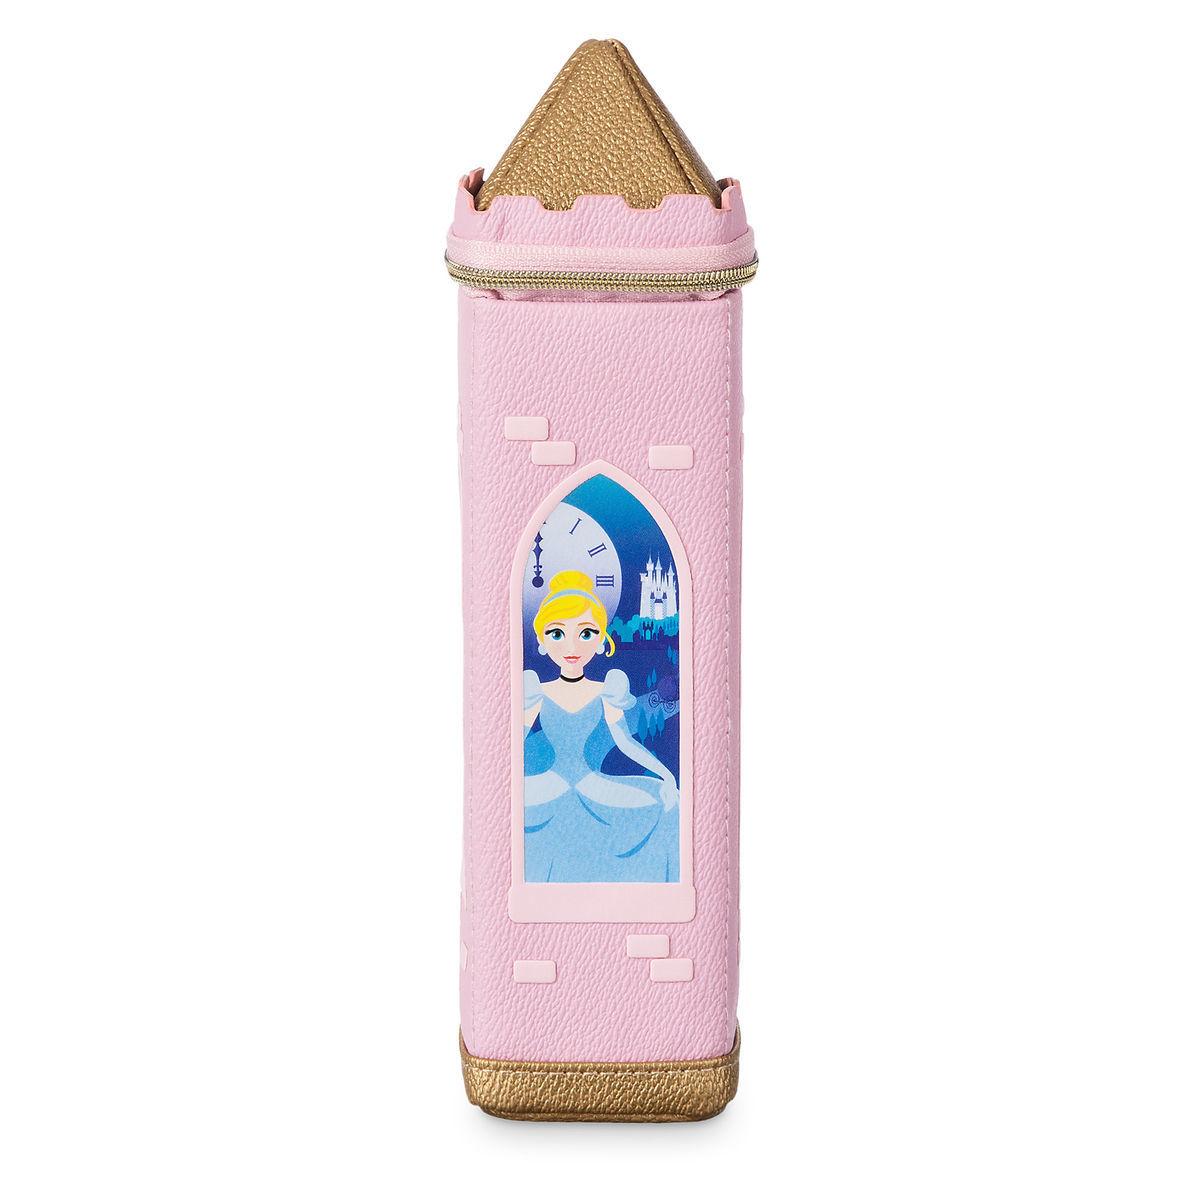 back to school supplies best disney merchandise princesses pencil case holder